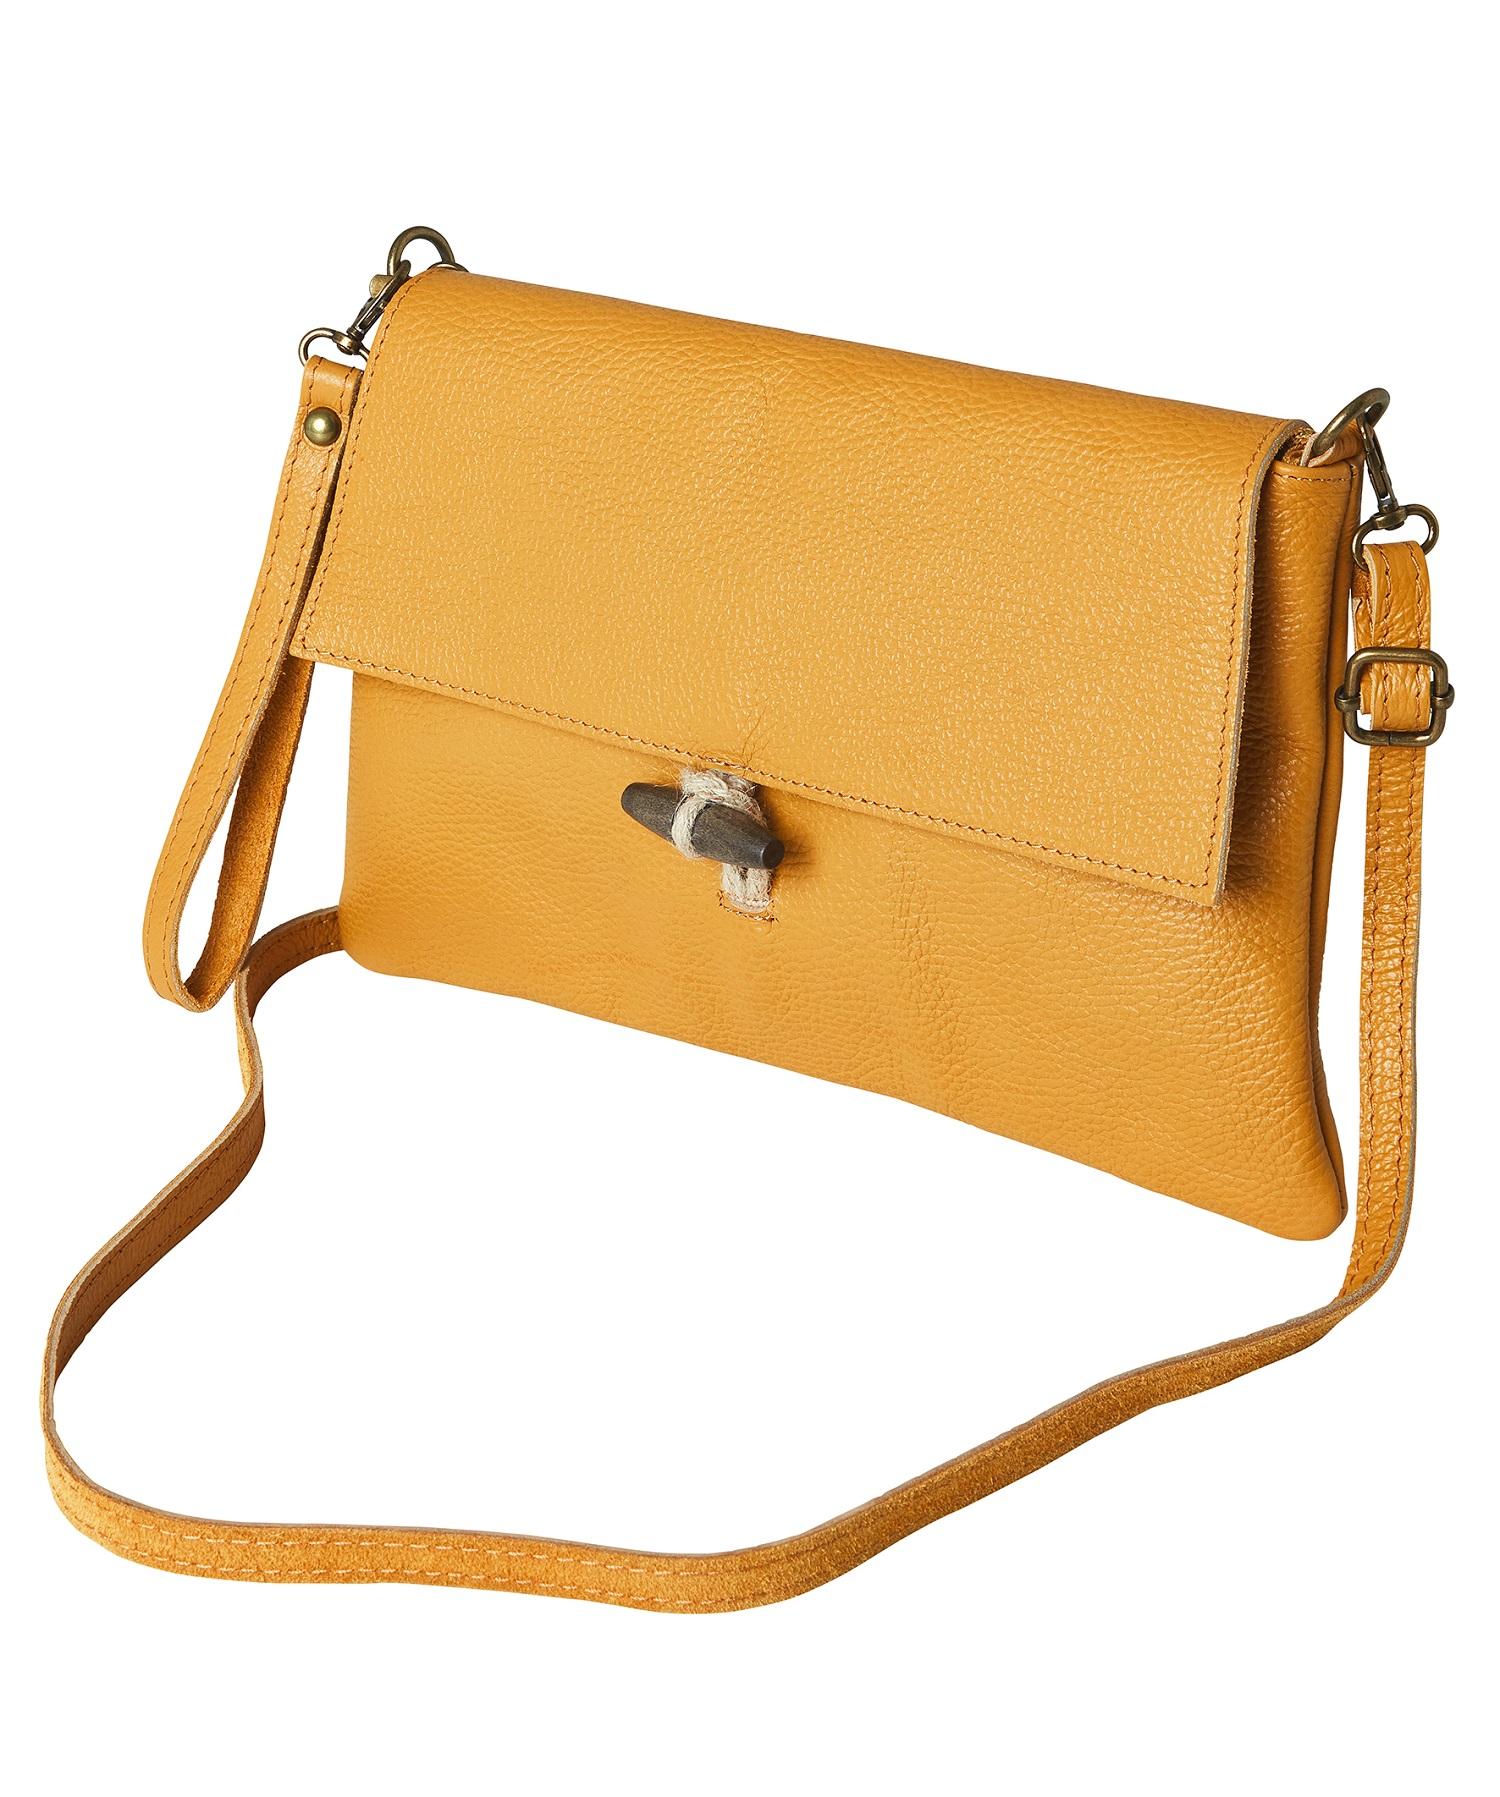 Magic of Milan Soft Leather Bag £49 Joe Browns